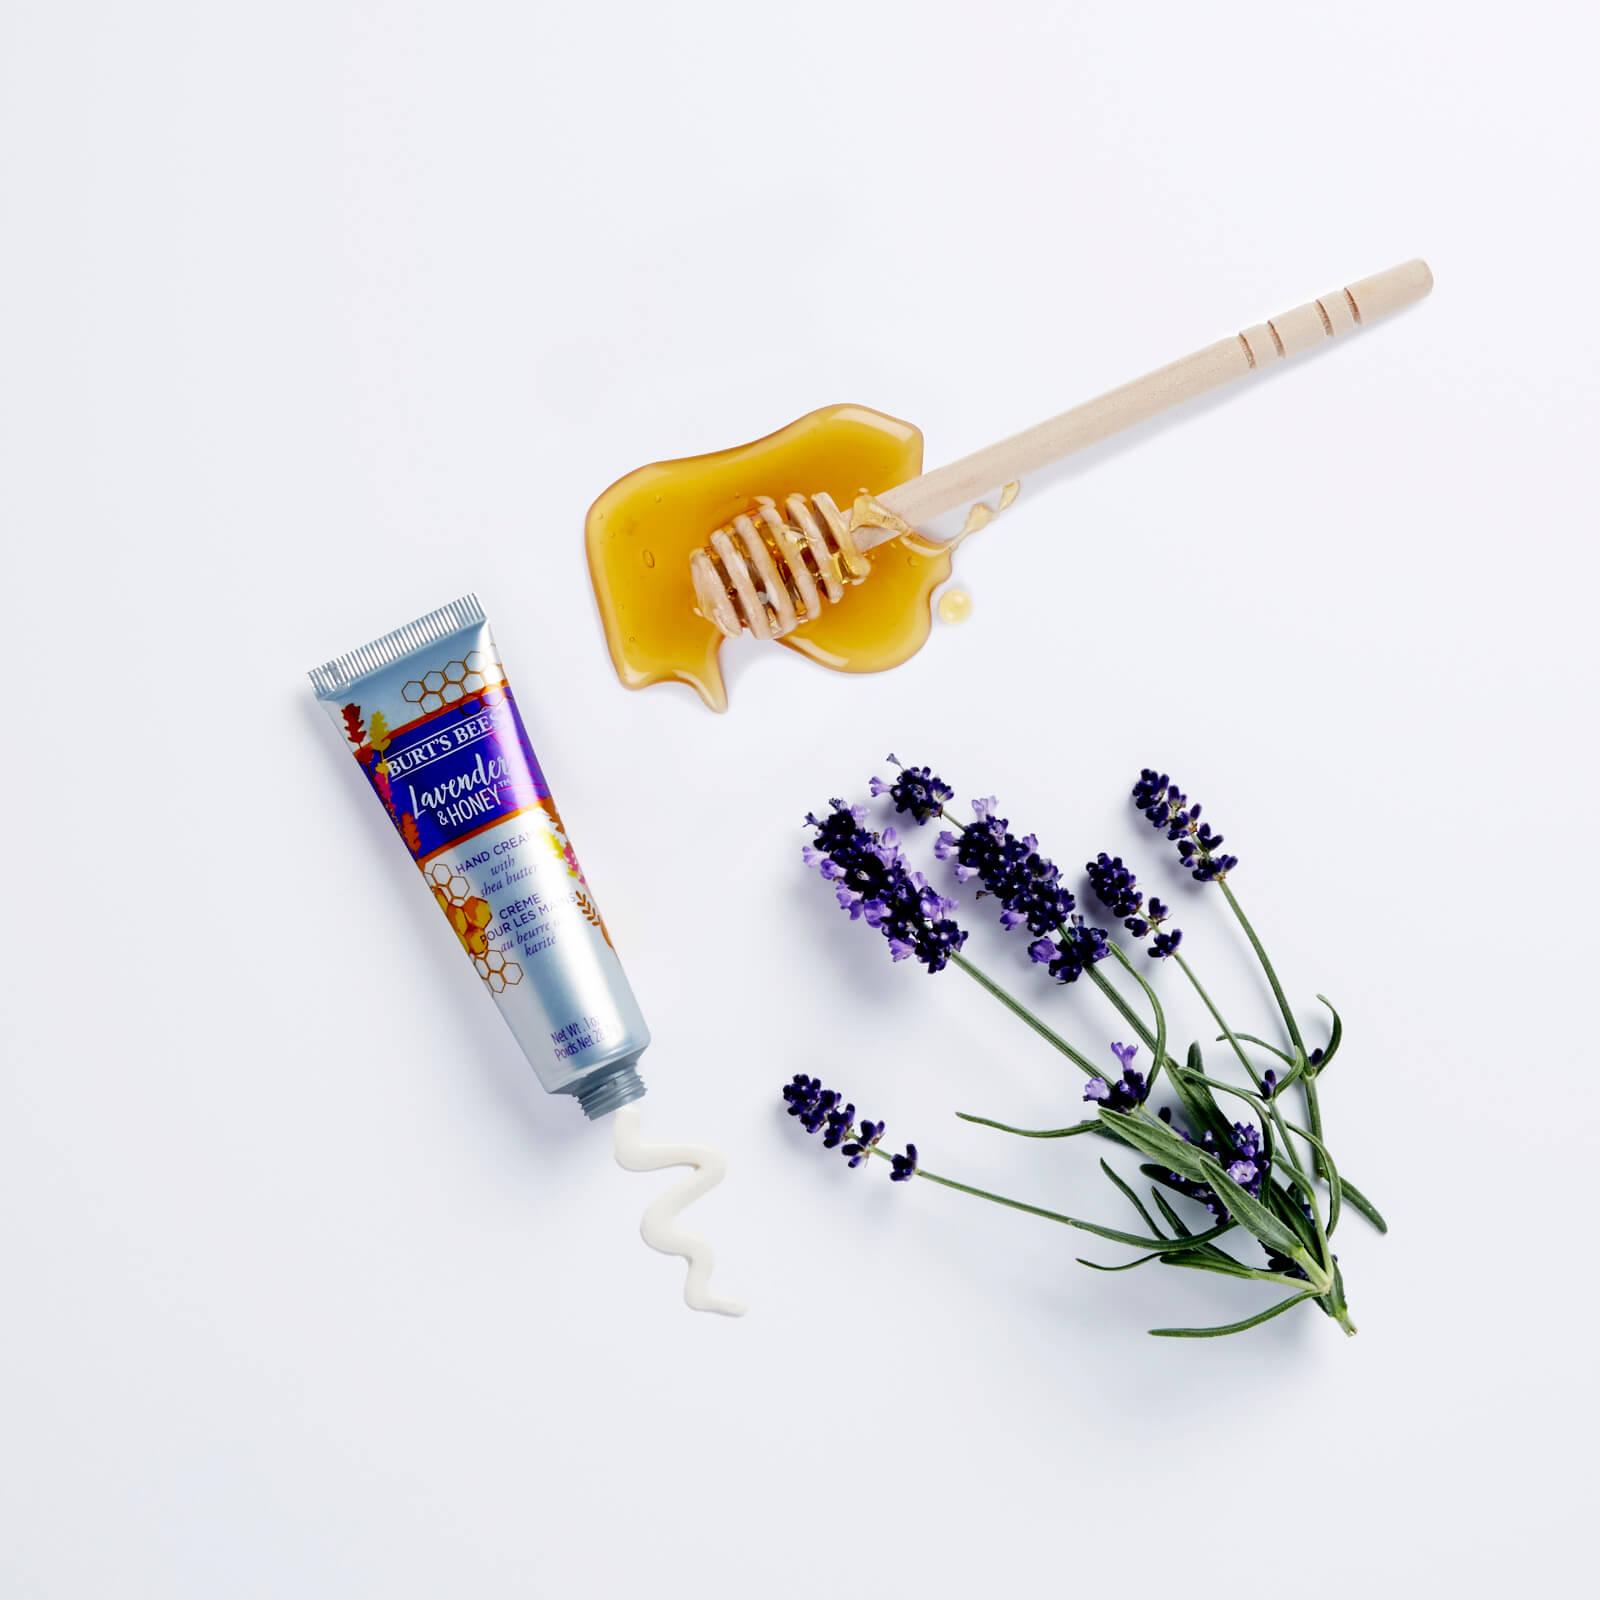 Lavender & Honey Hand Cream 28.3g